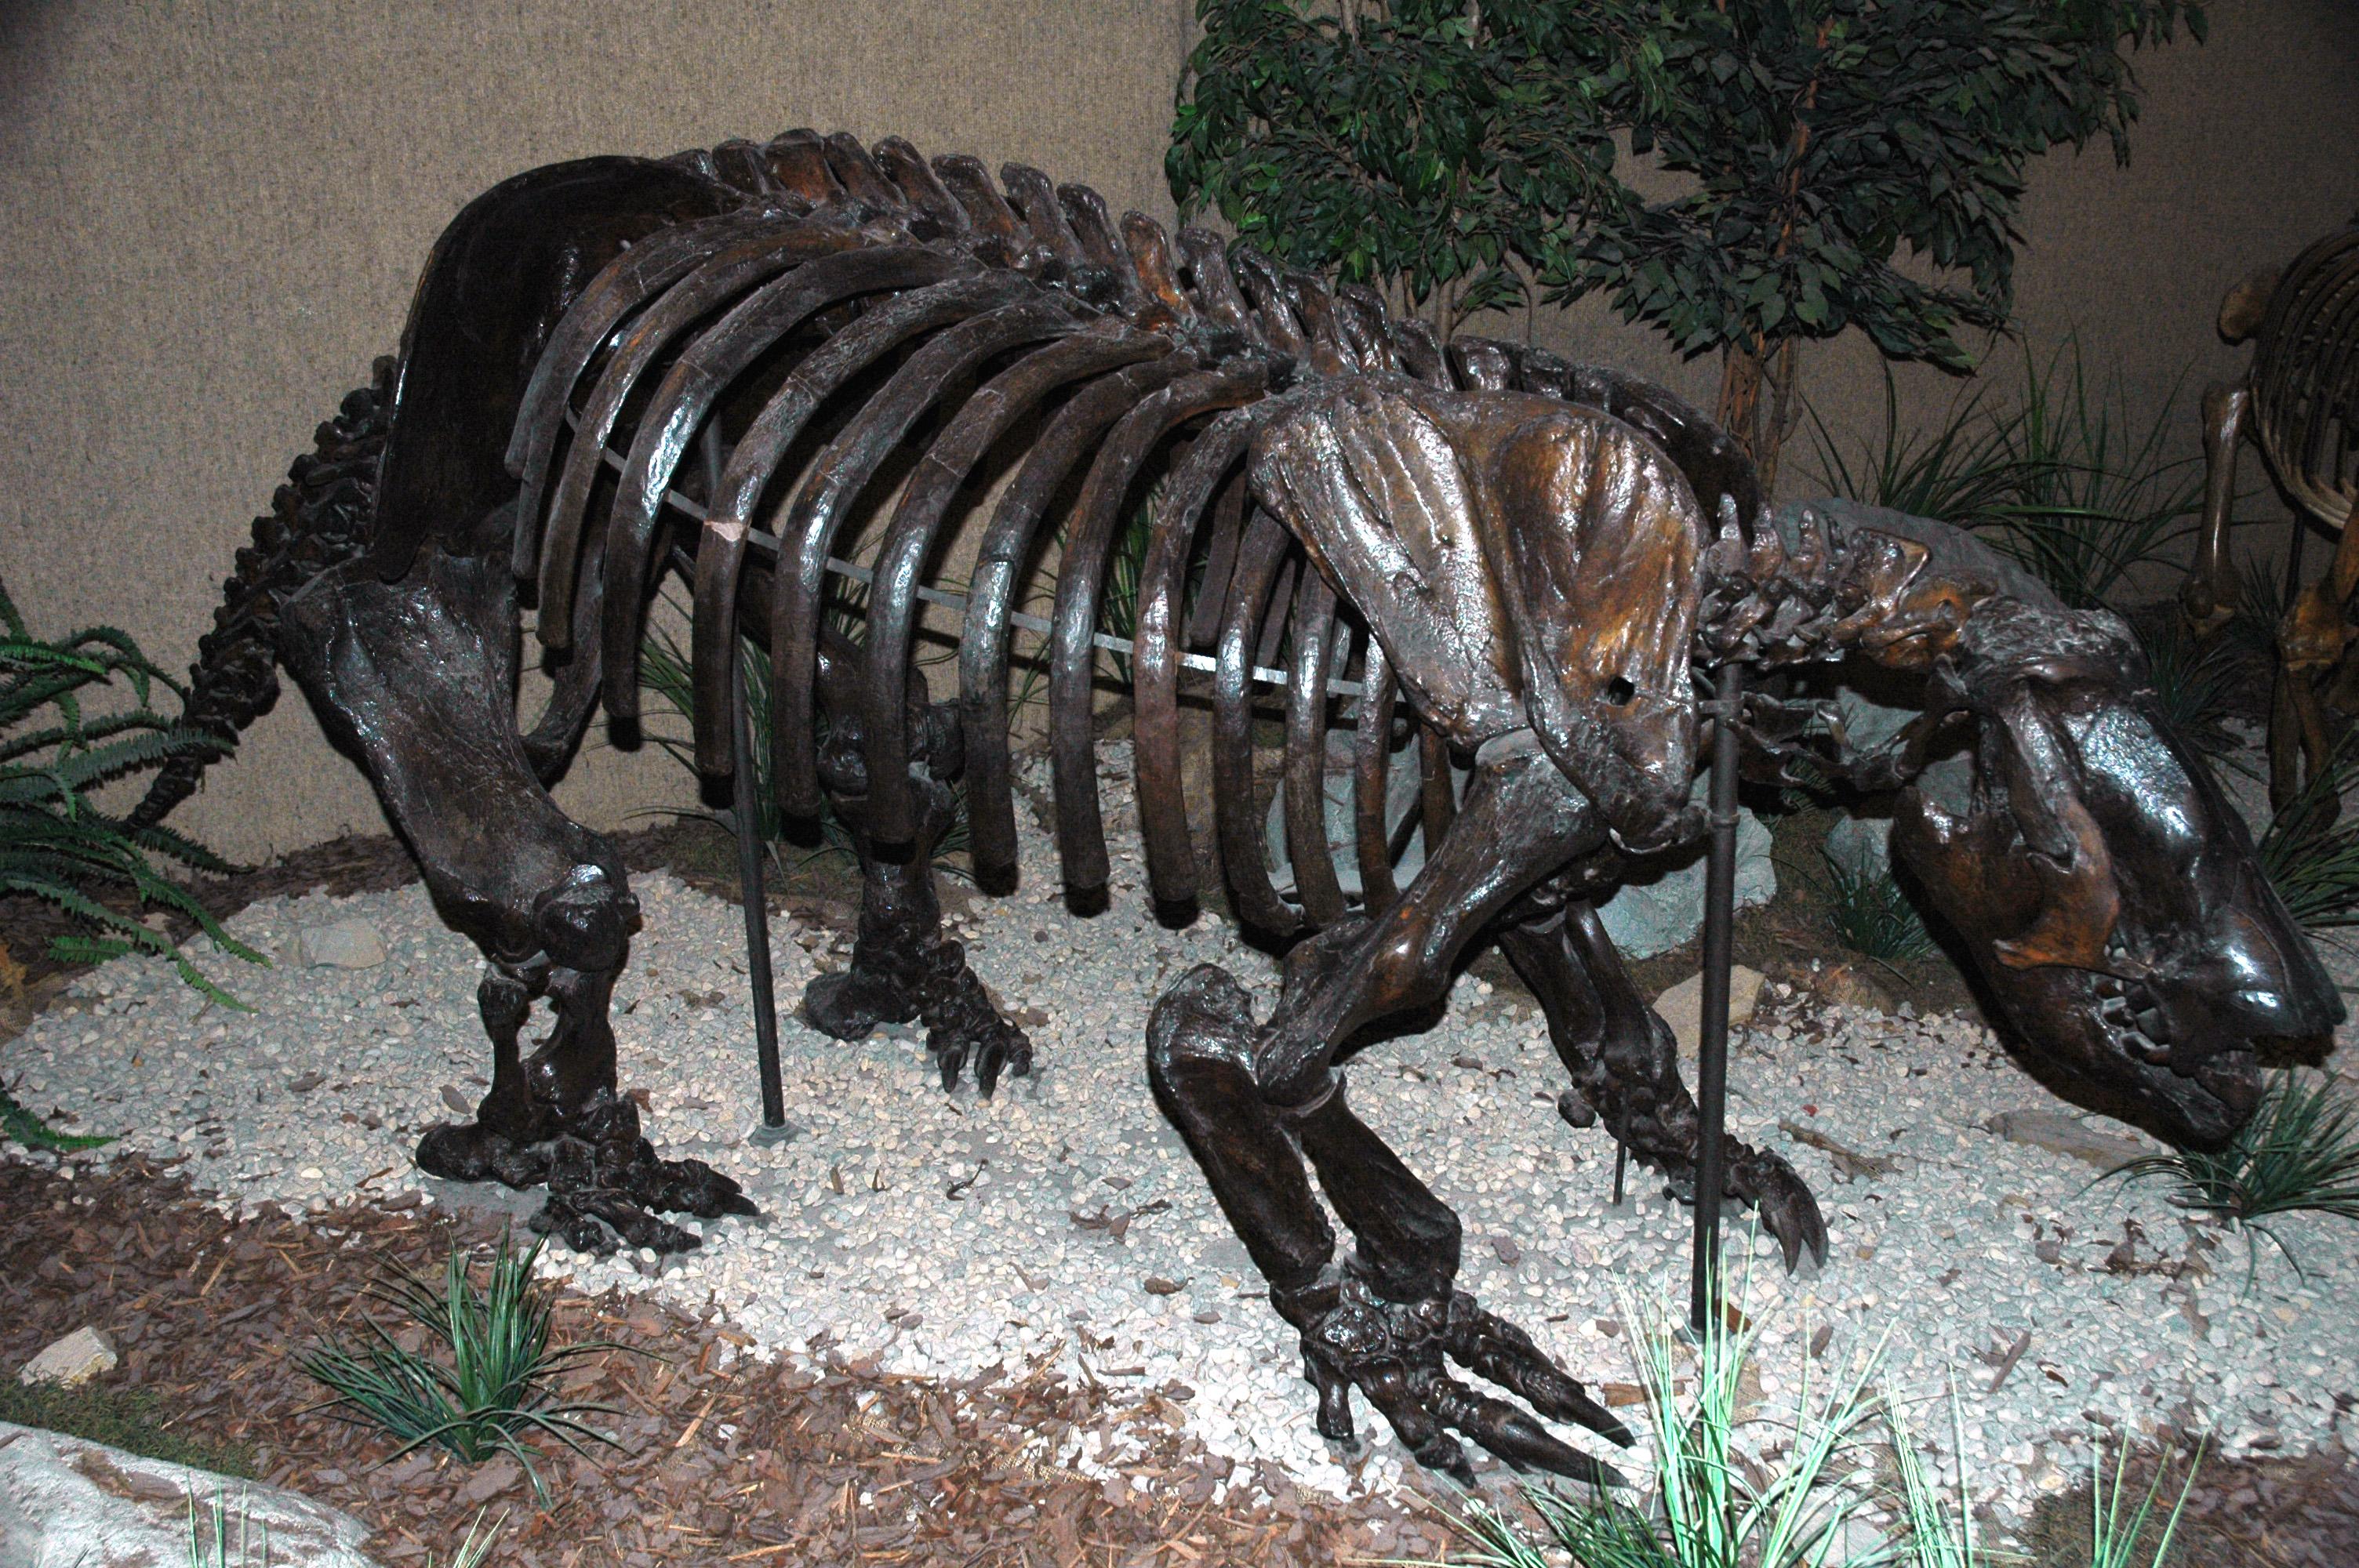 fileparamylodon harlani ground sloth la brea asphalt upper pleistocene rancho la